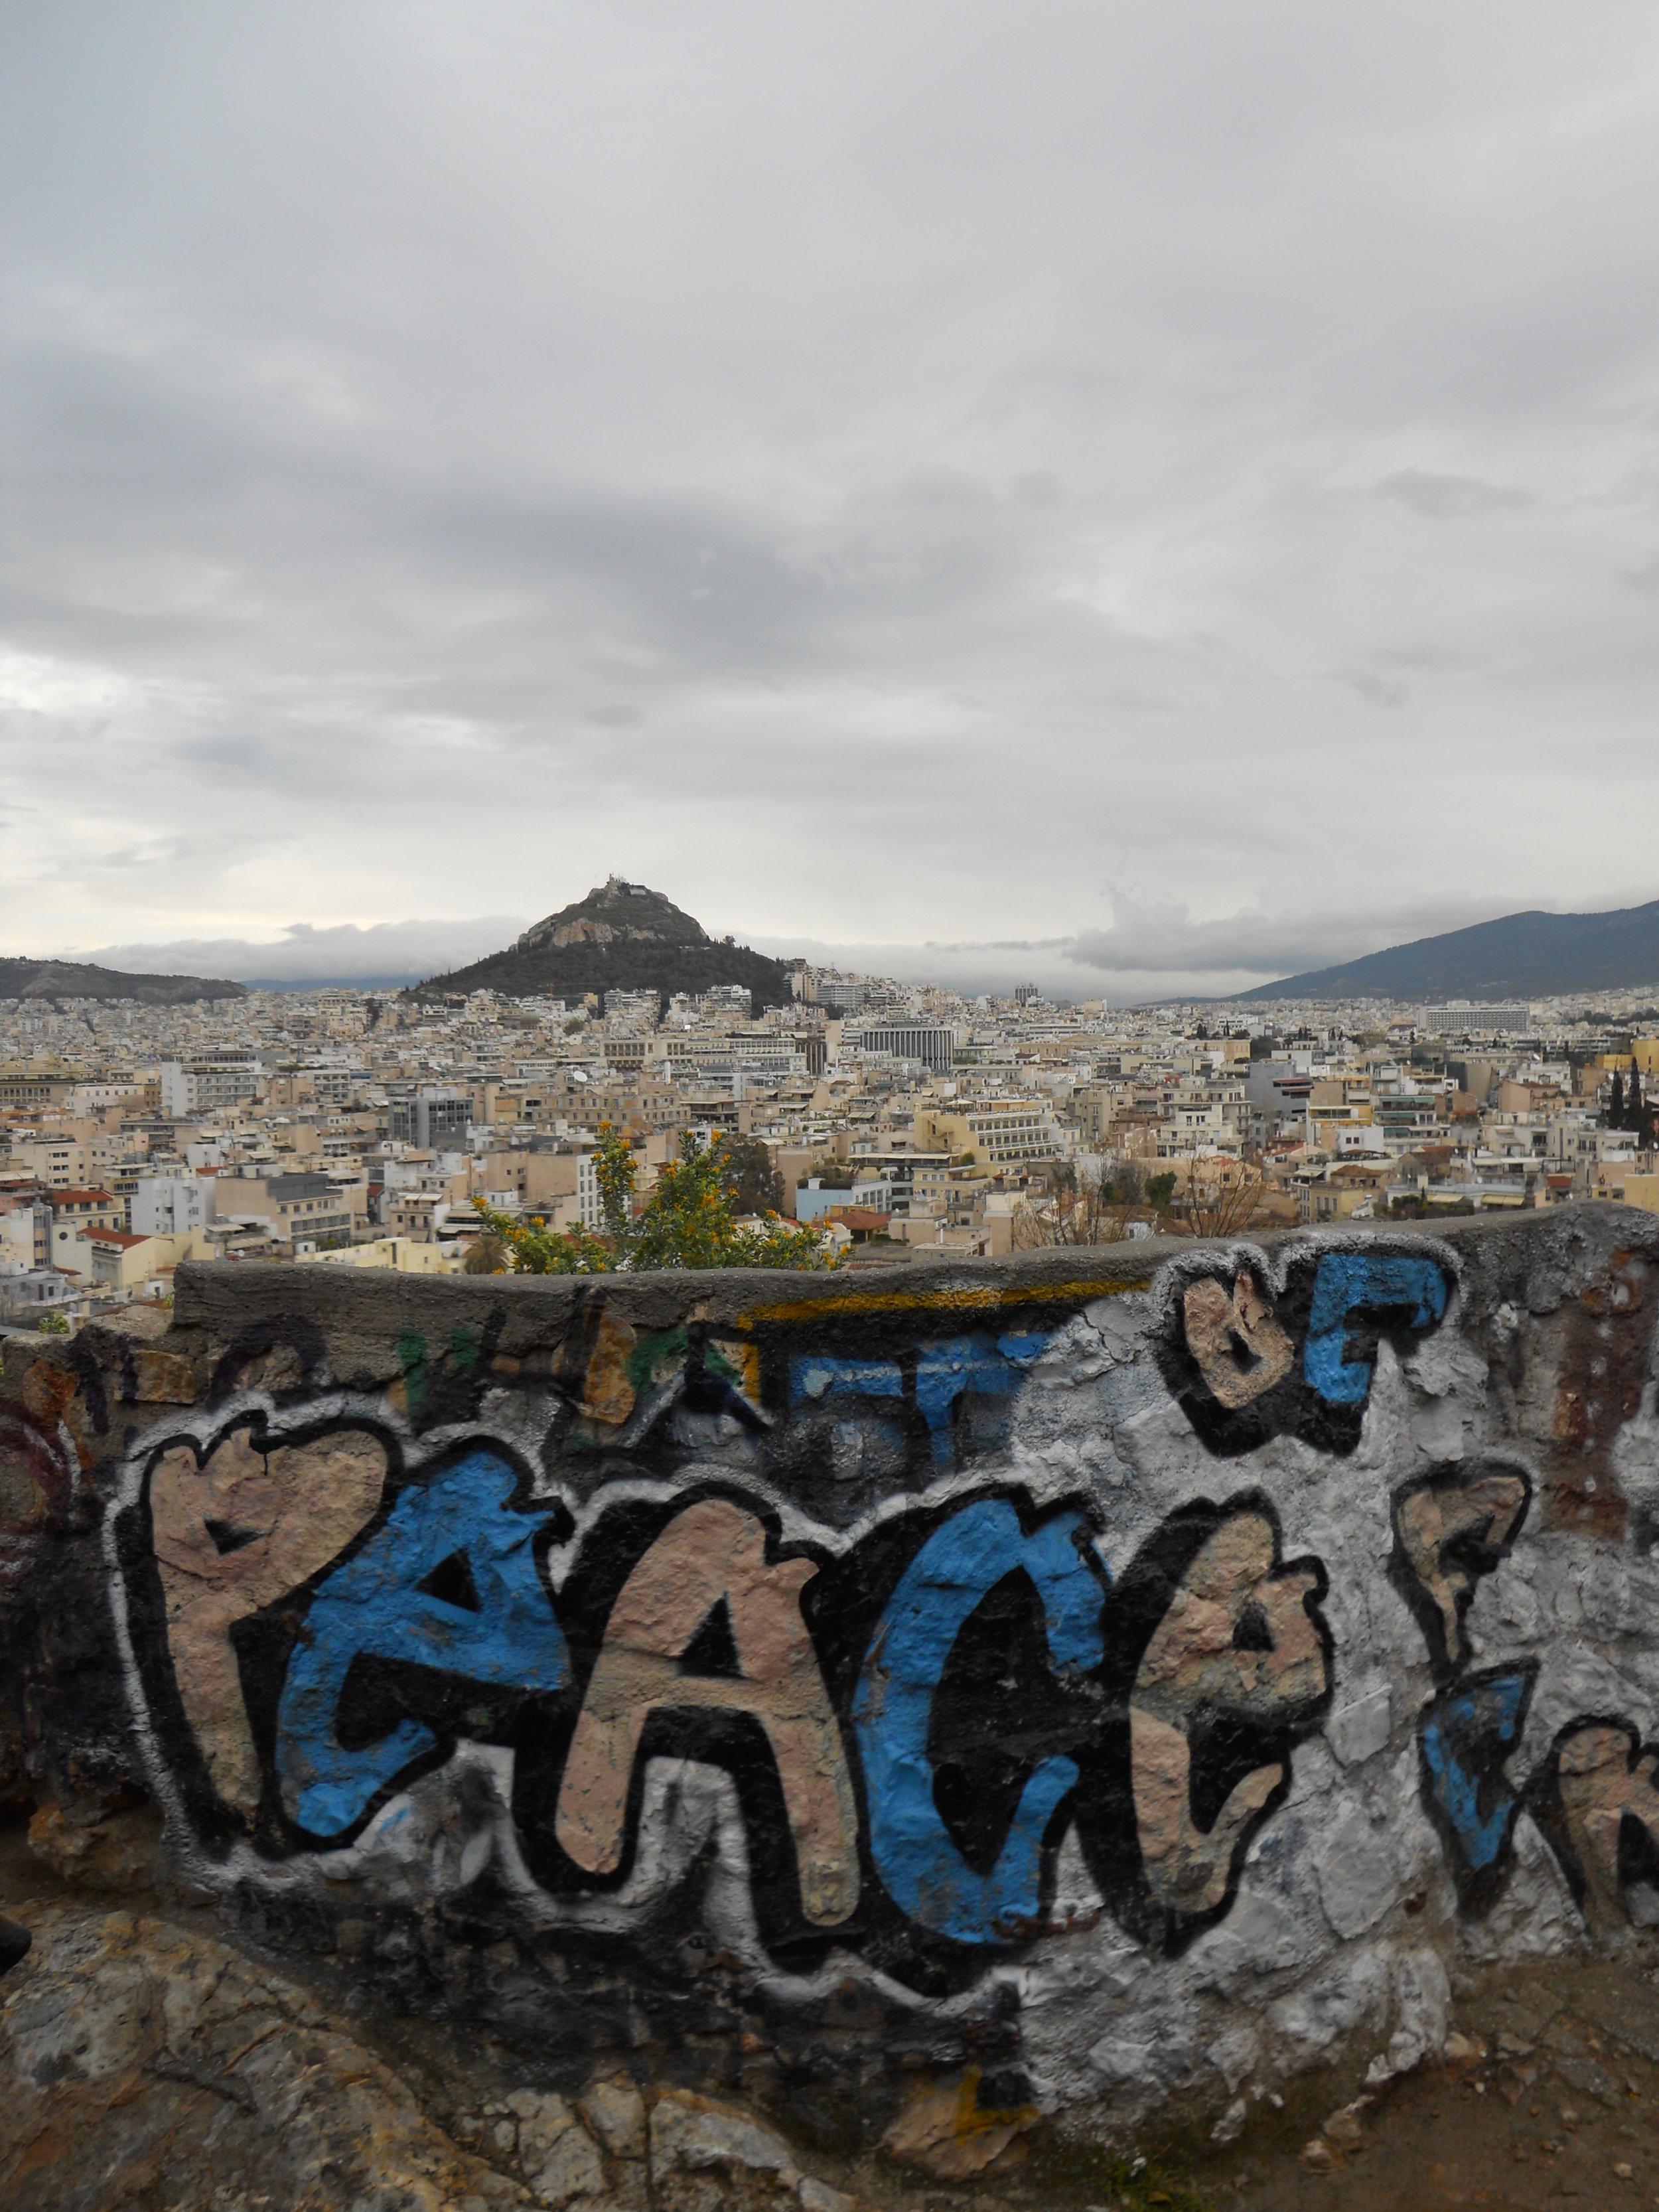 Athens, Greece - Near the Acropolis